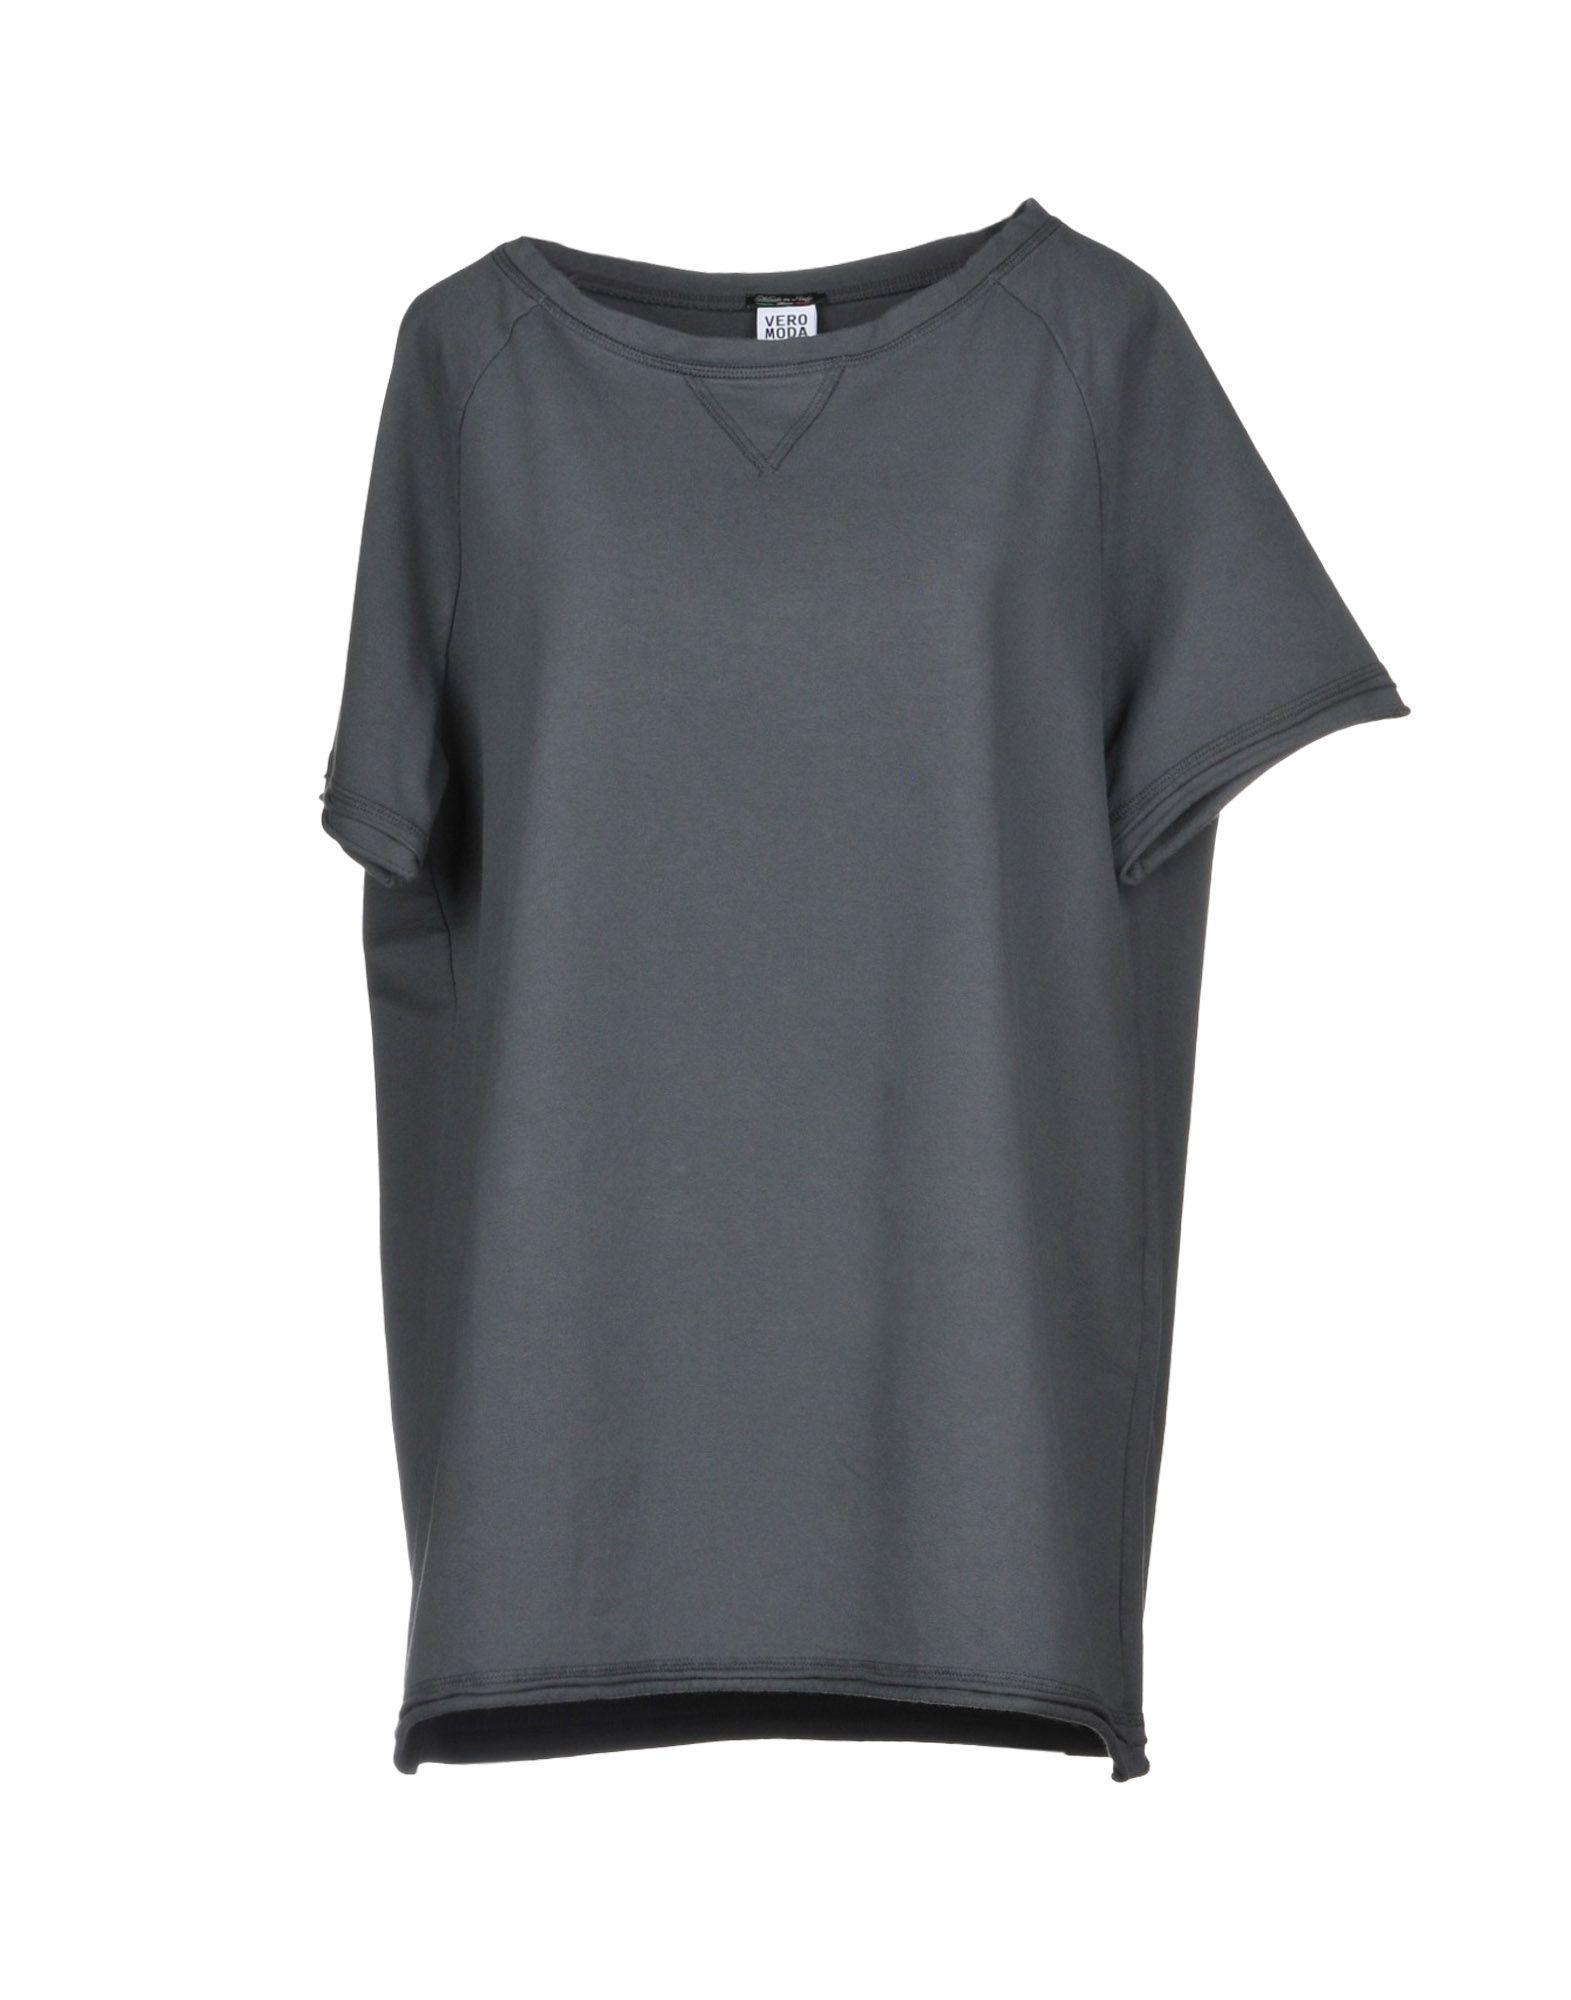 VERO MODA Футболка футболка vero moda цвет черный